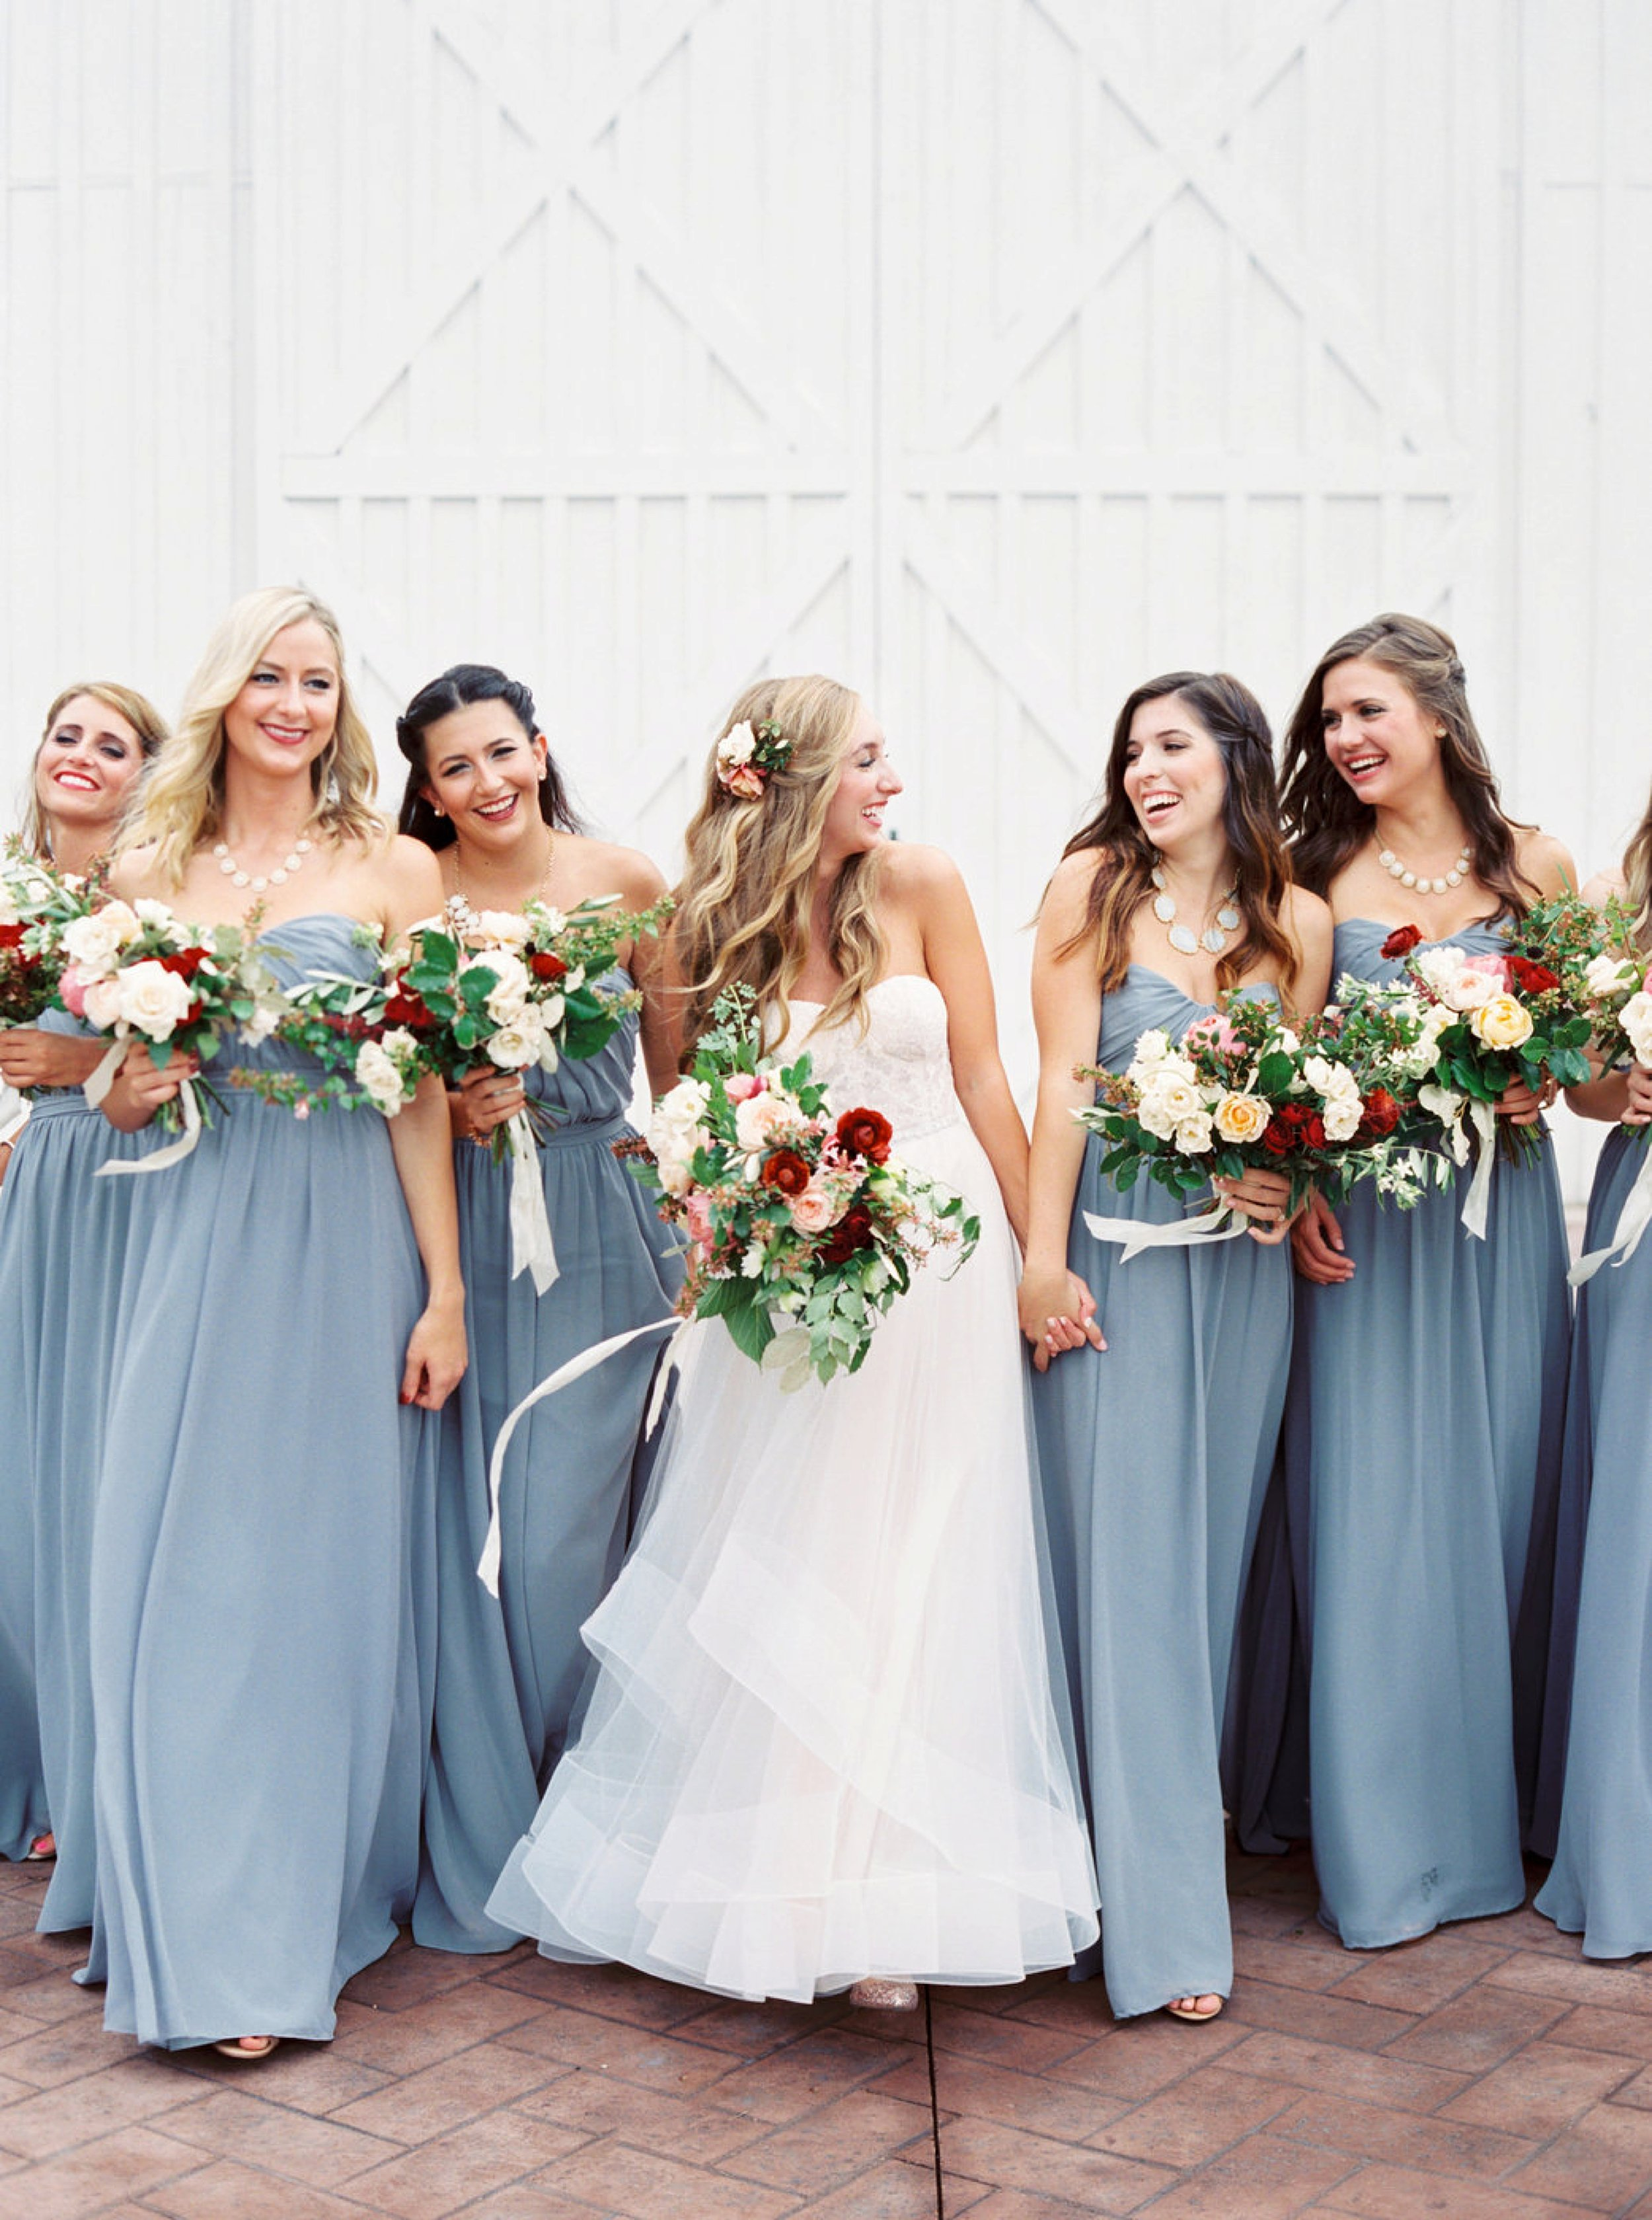 Dusty Blue Bridesmaid Dresses, White Sparrow Barn Wedding